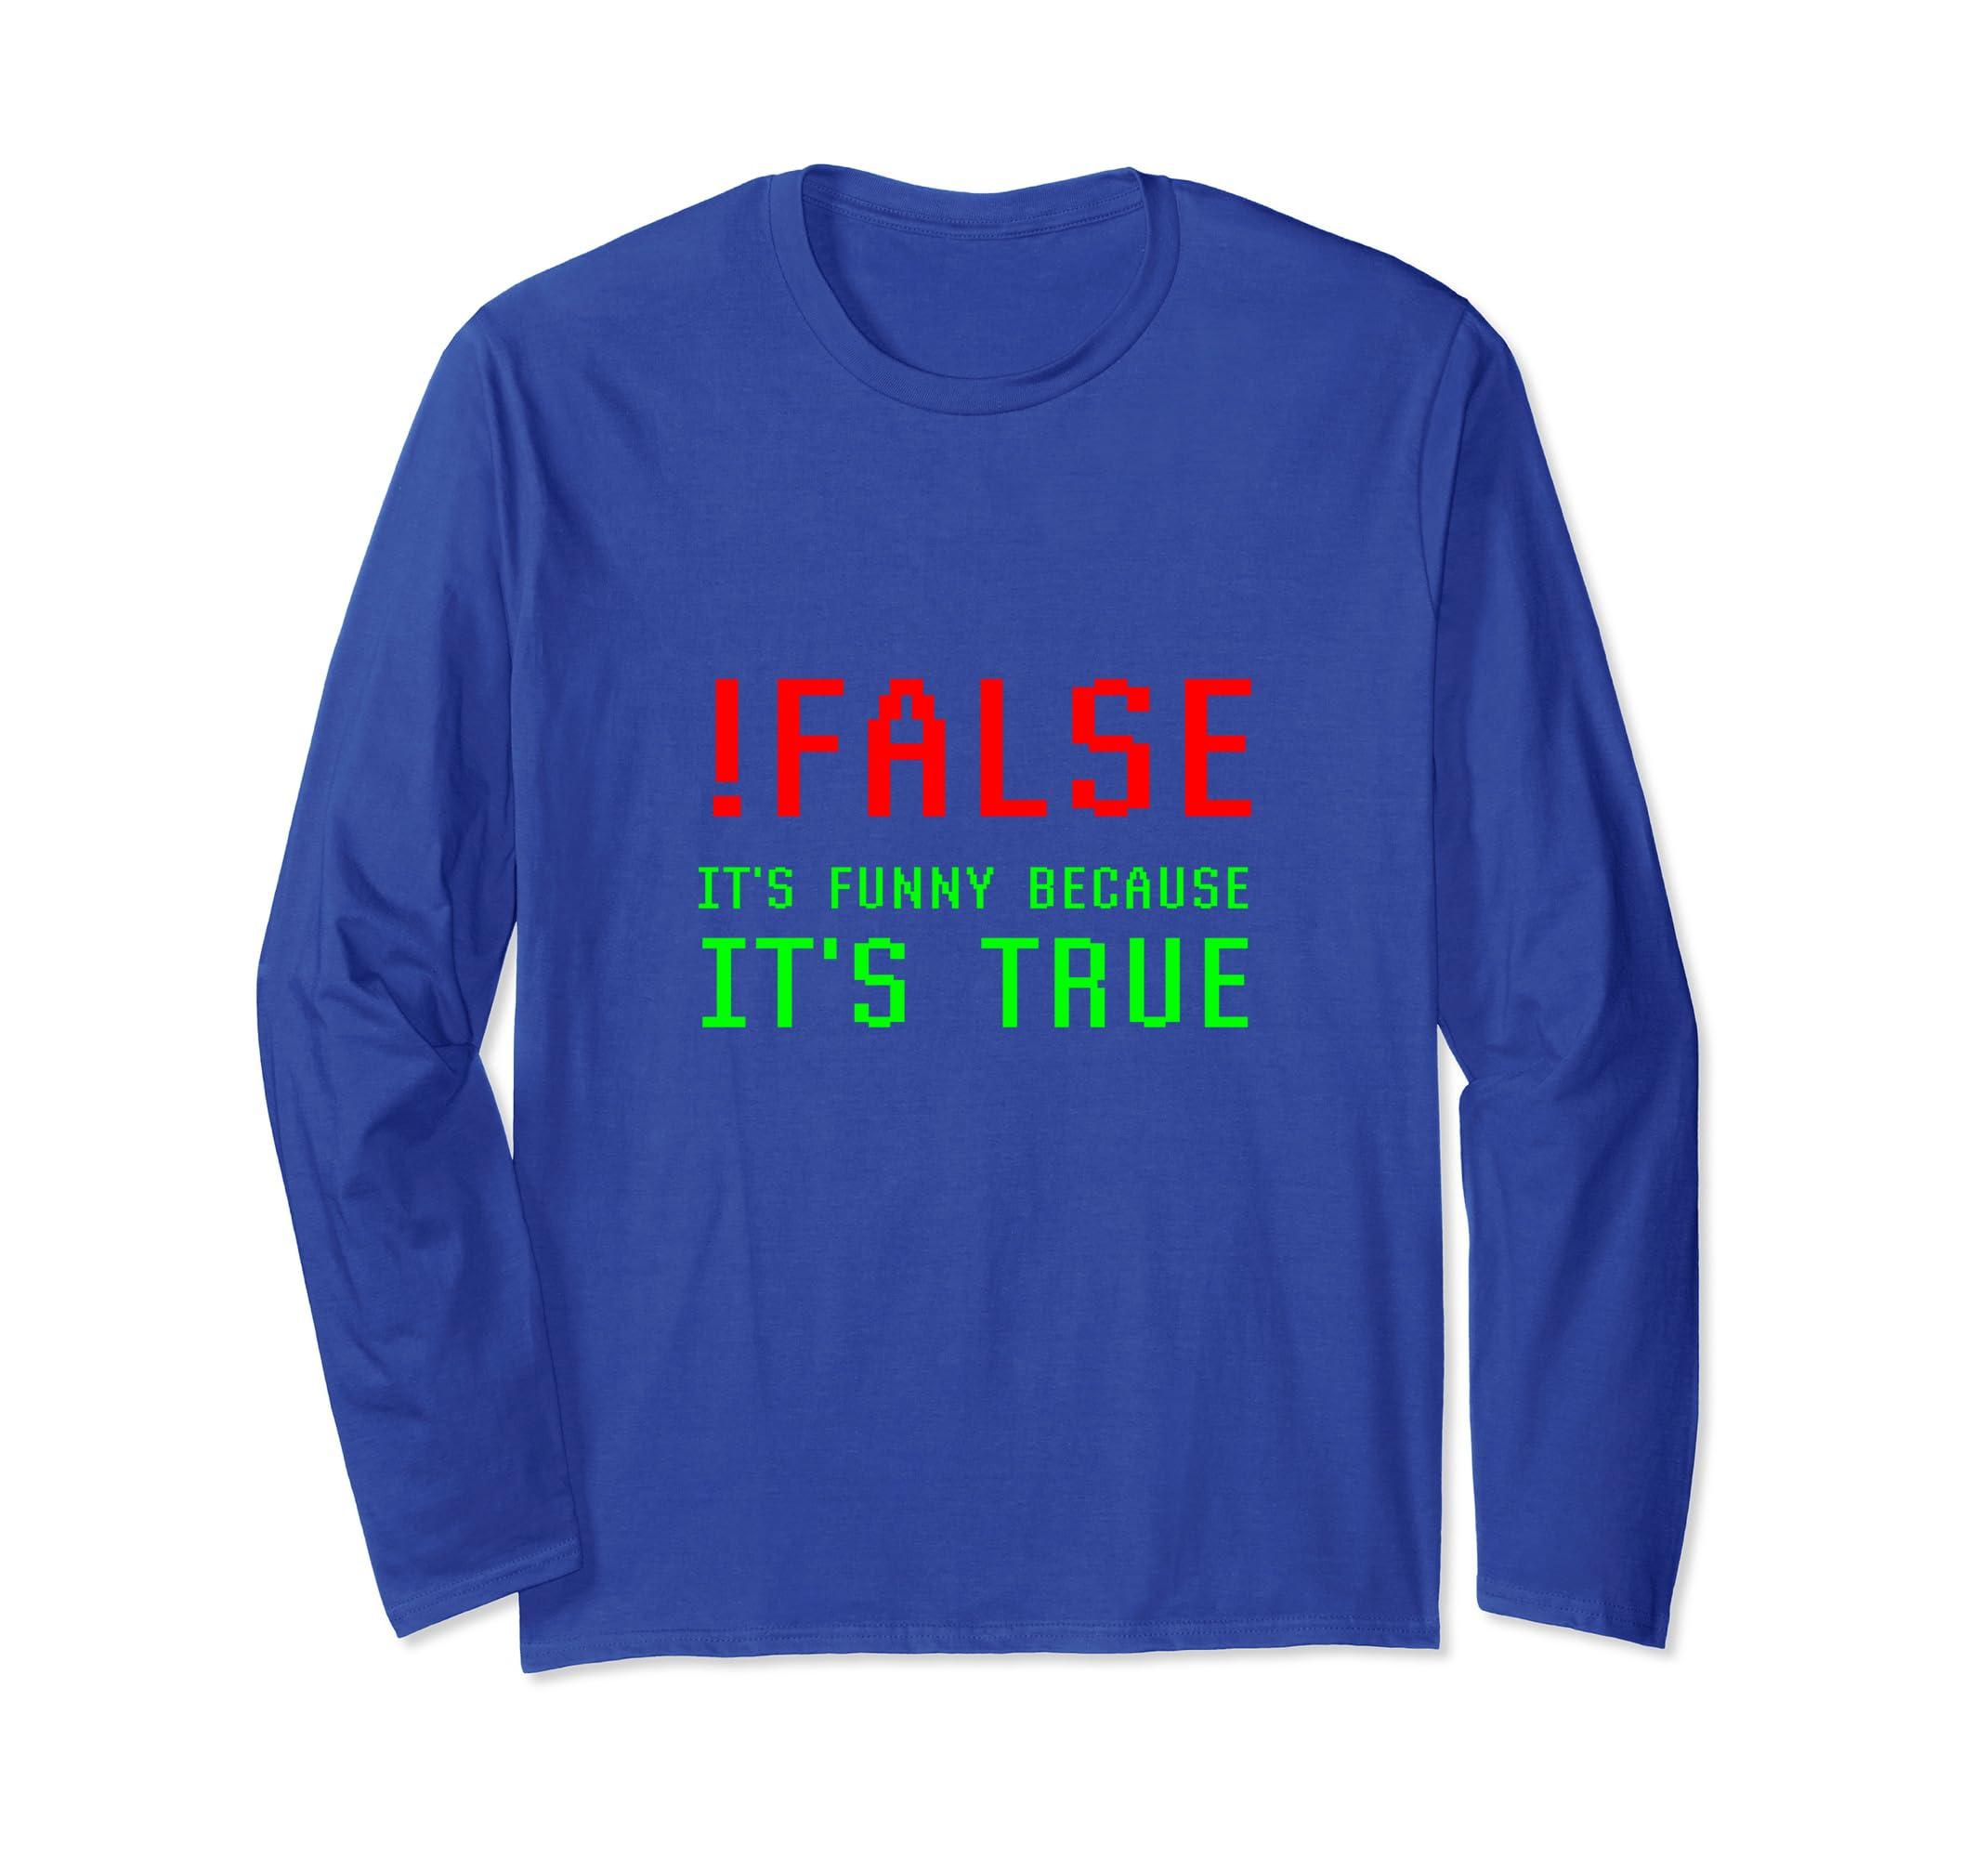 !False It's Funny Because It's True Programming Humor LS Tee-ln